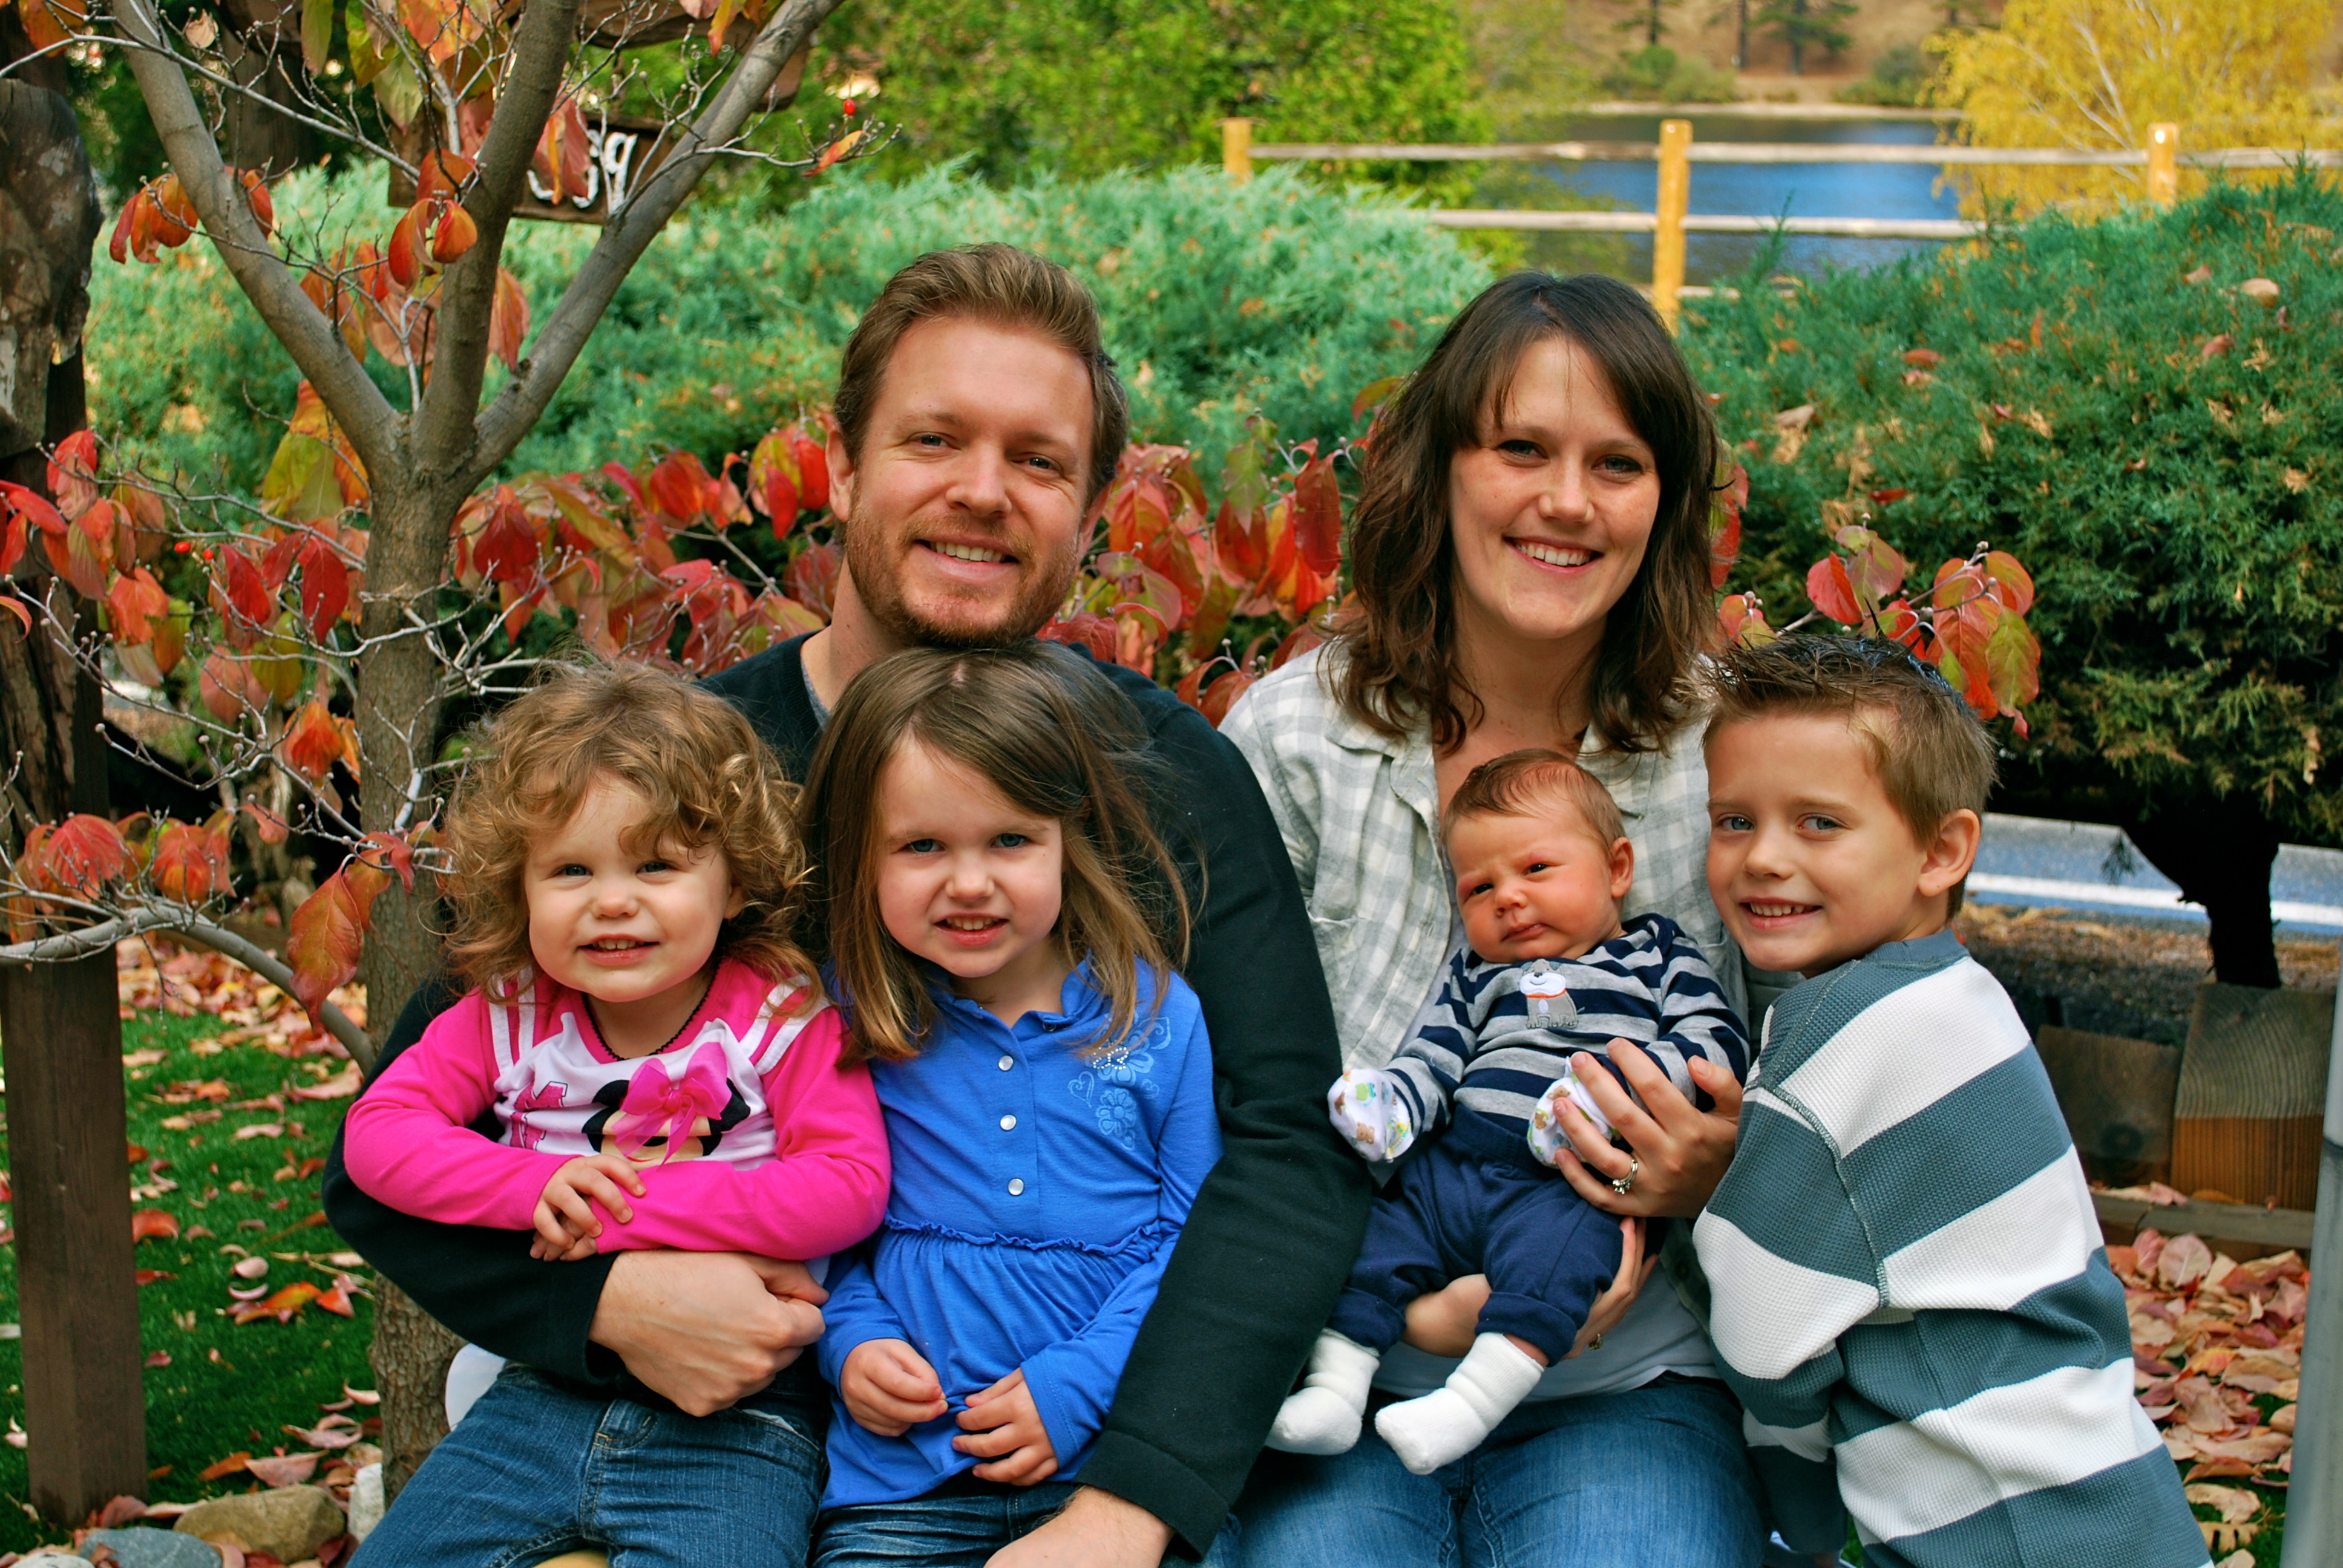 2013-07-15-hazelsfamily.JPG